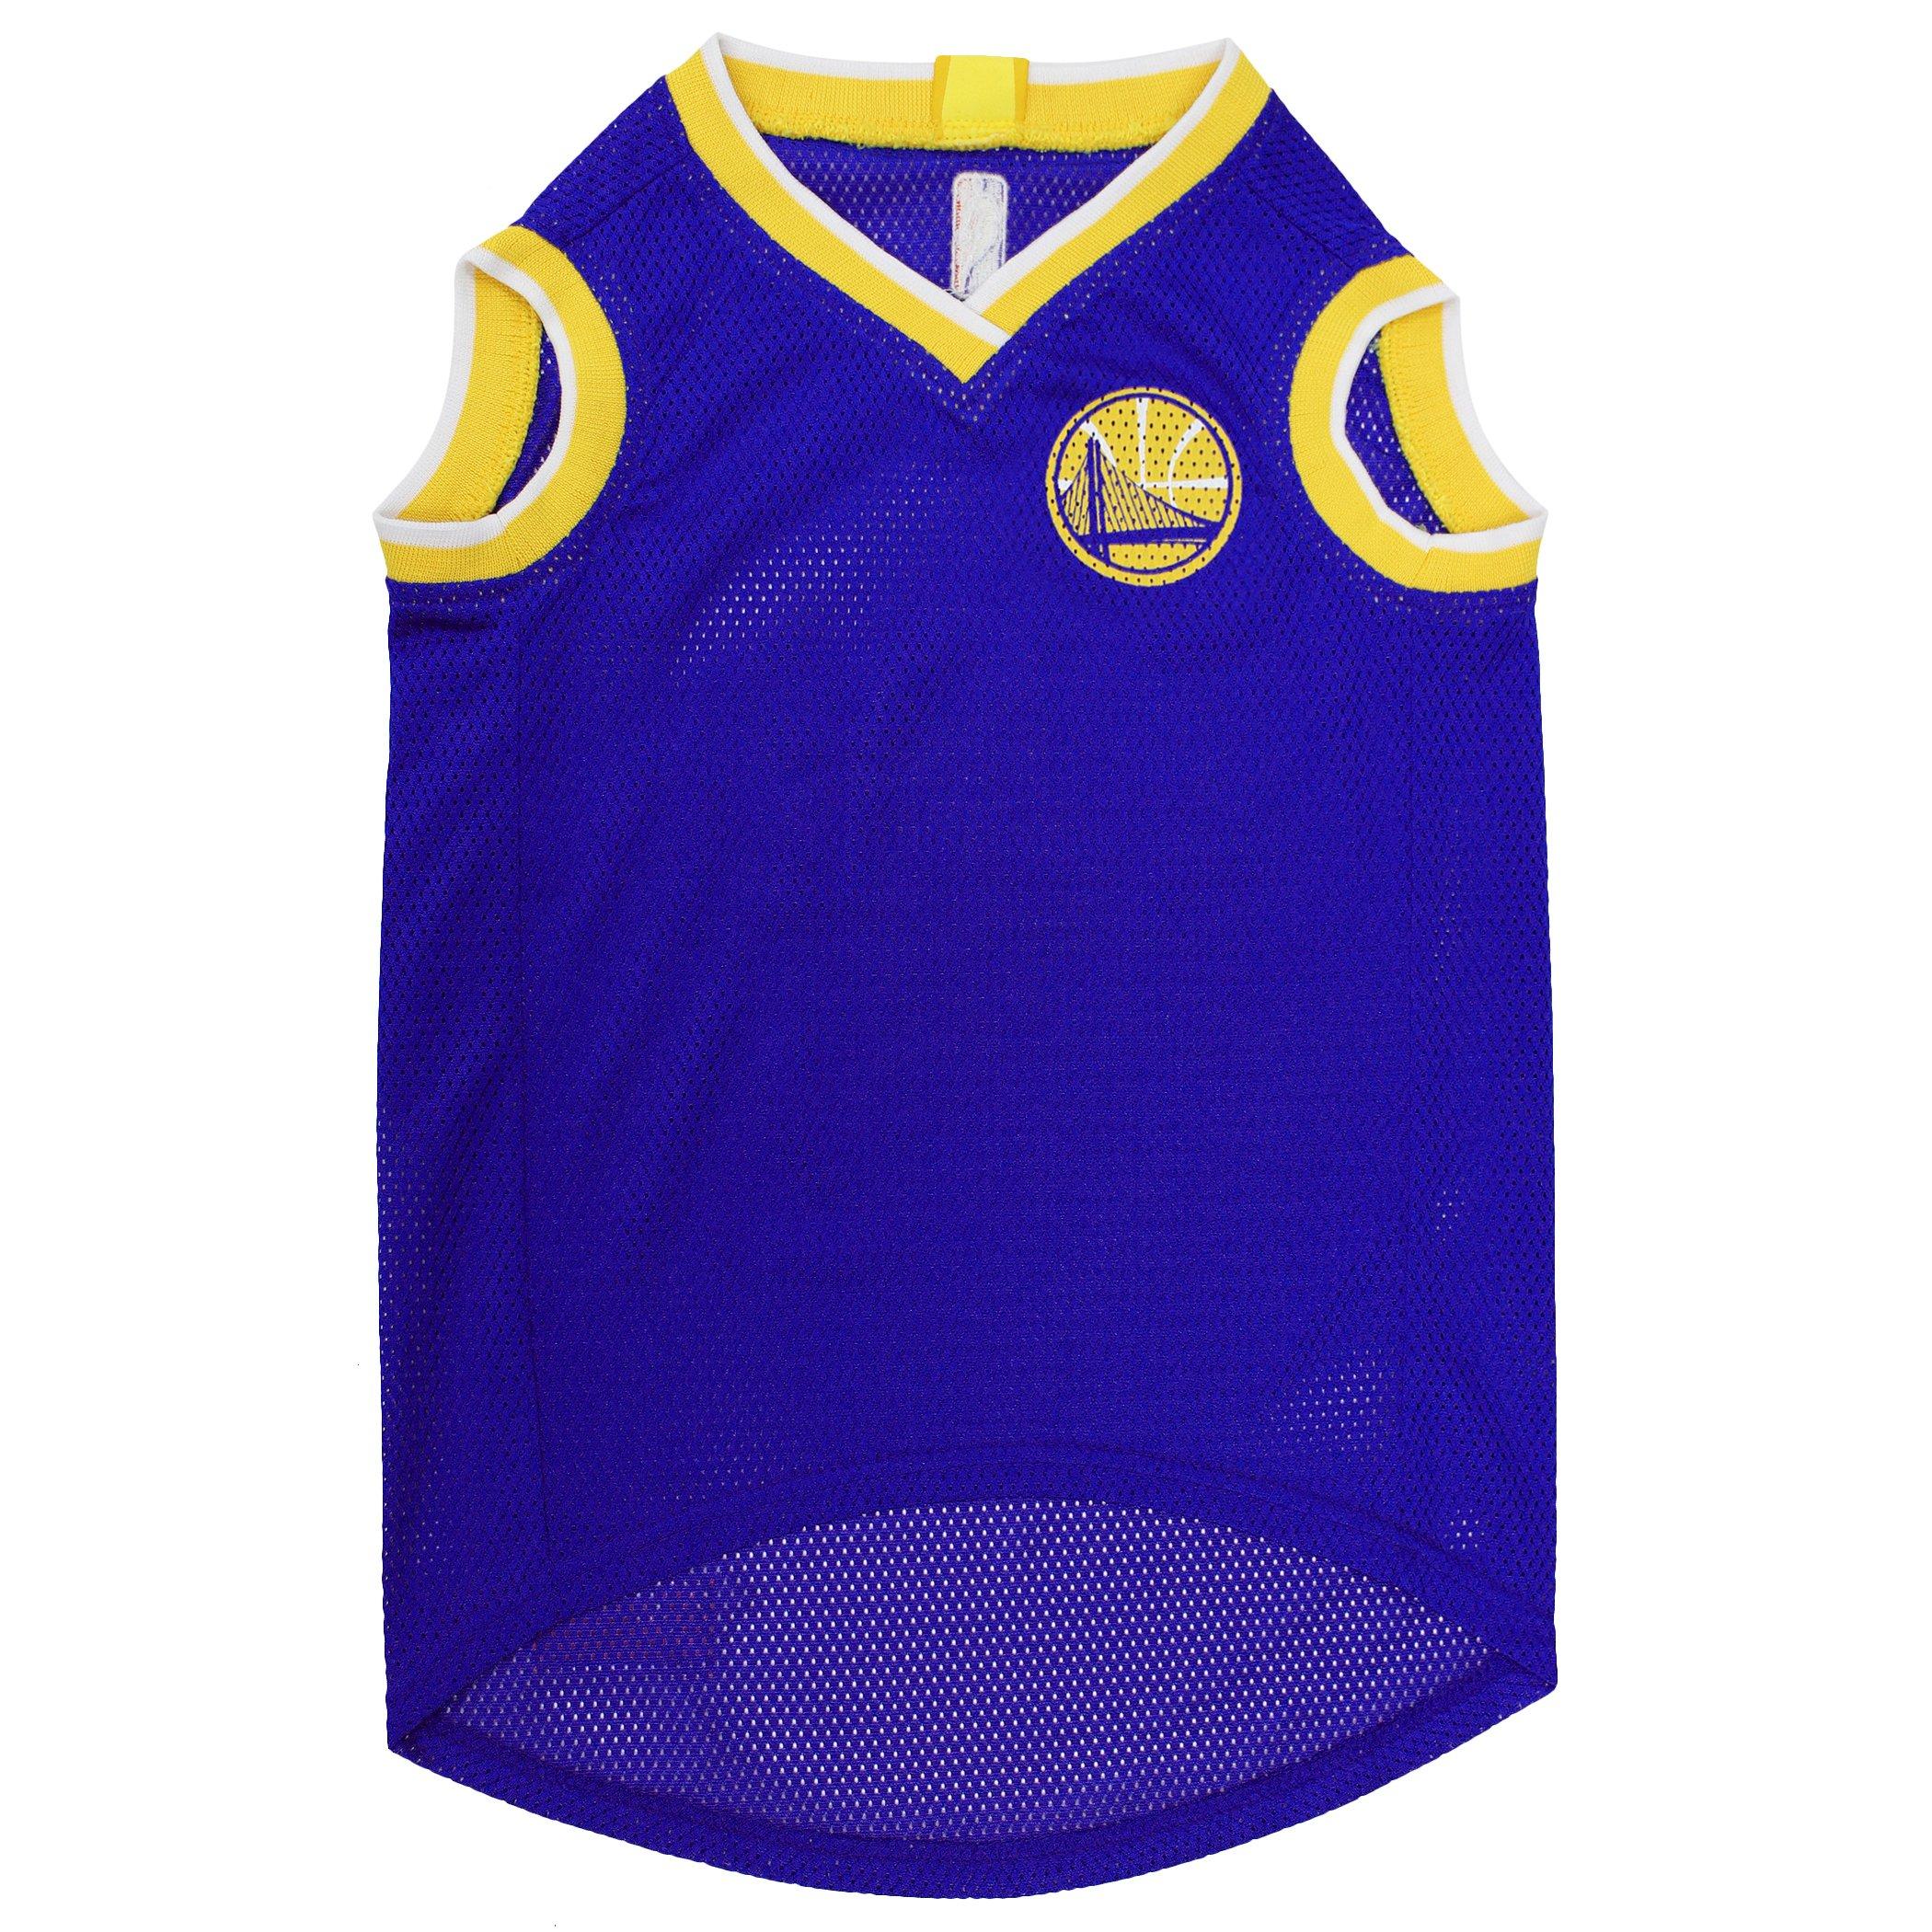 low cost c5a36 53344 Details about NBA GOLDEN STATE WARRIORS DOG Jersey, Medium - Tank Top  Basketball Pet Jersey